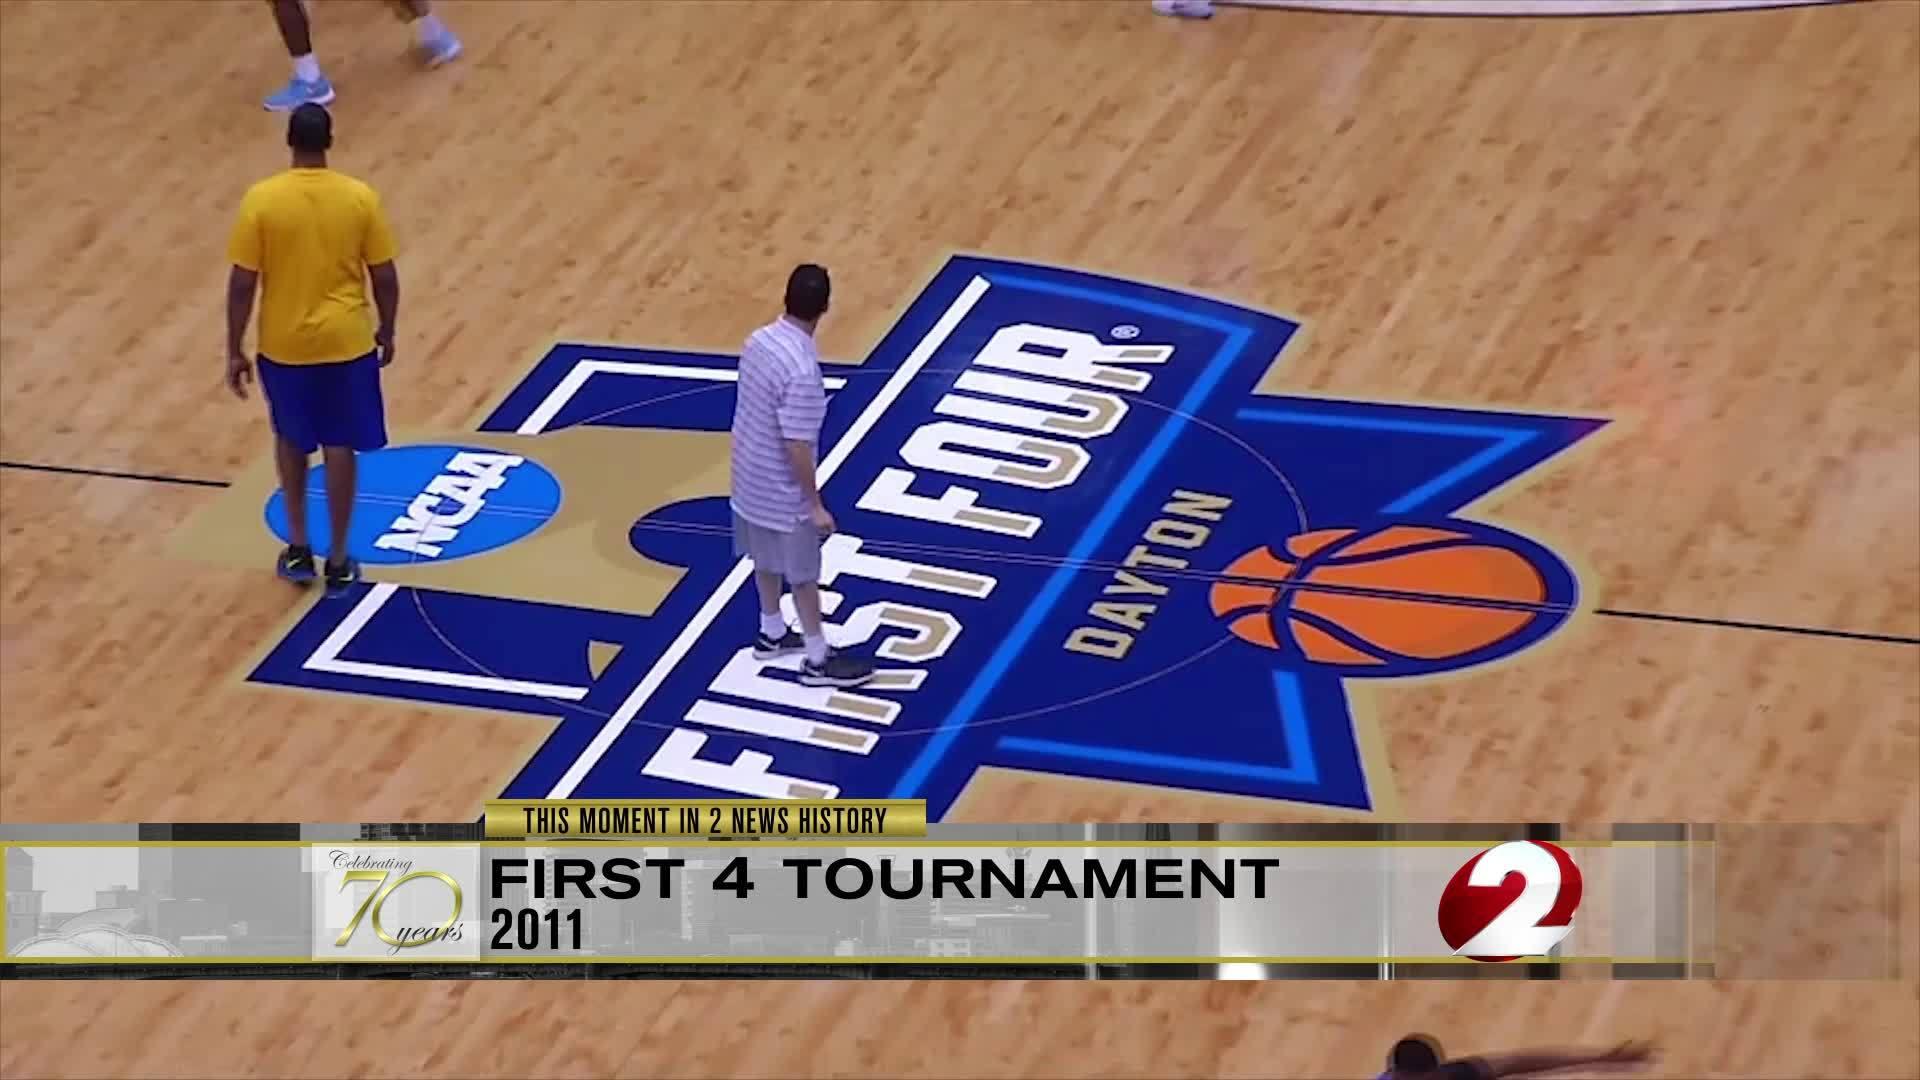 First_Four_Tournament_5_20190307195018